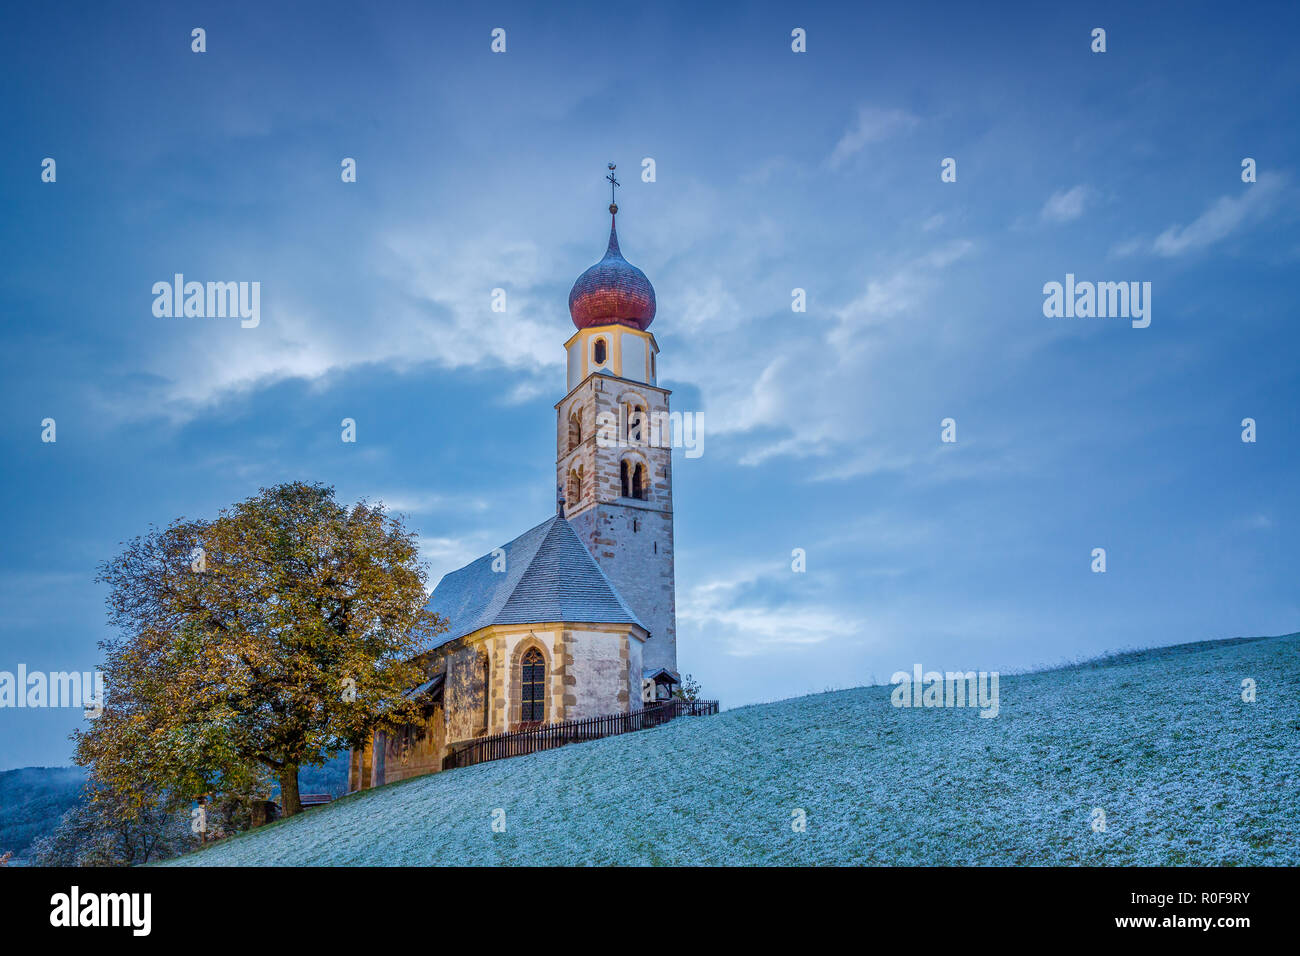 Church of Saint Valentine on a snowy day, Seis am Schlern, Siusi allo Sciliar, Dolomites, Trentino-Alto Adige, Italy Stock Photo